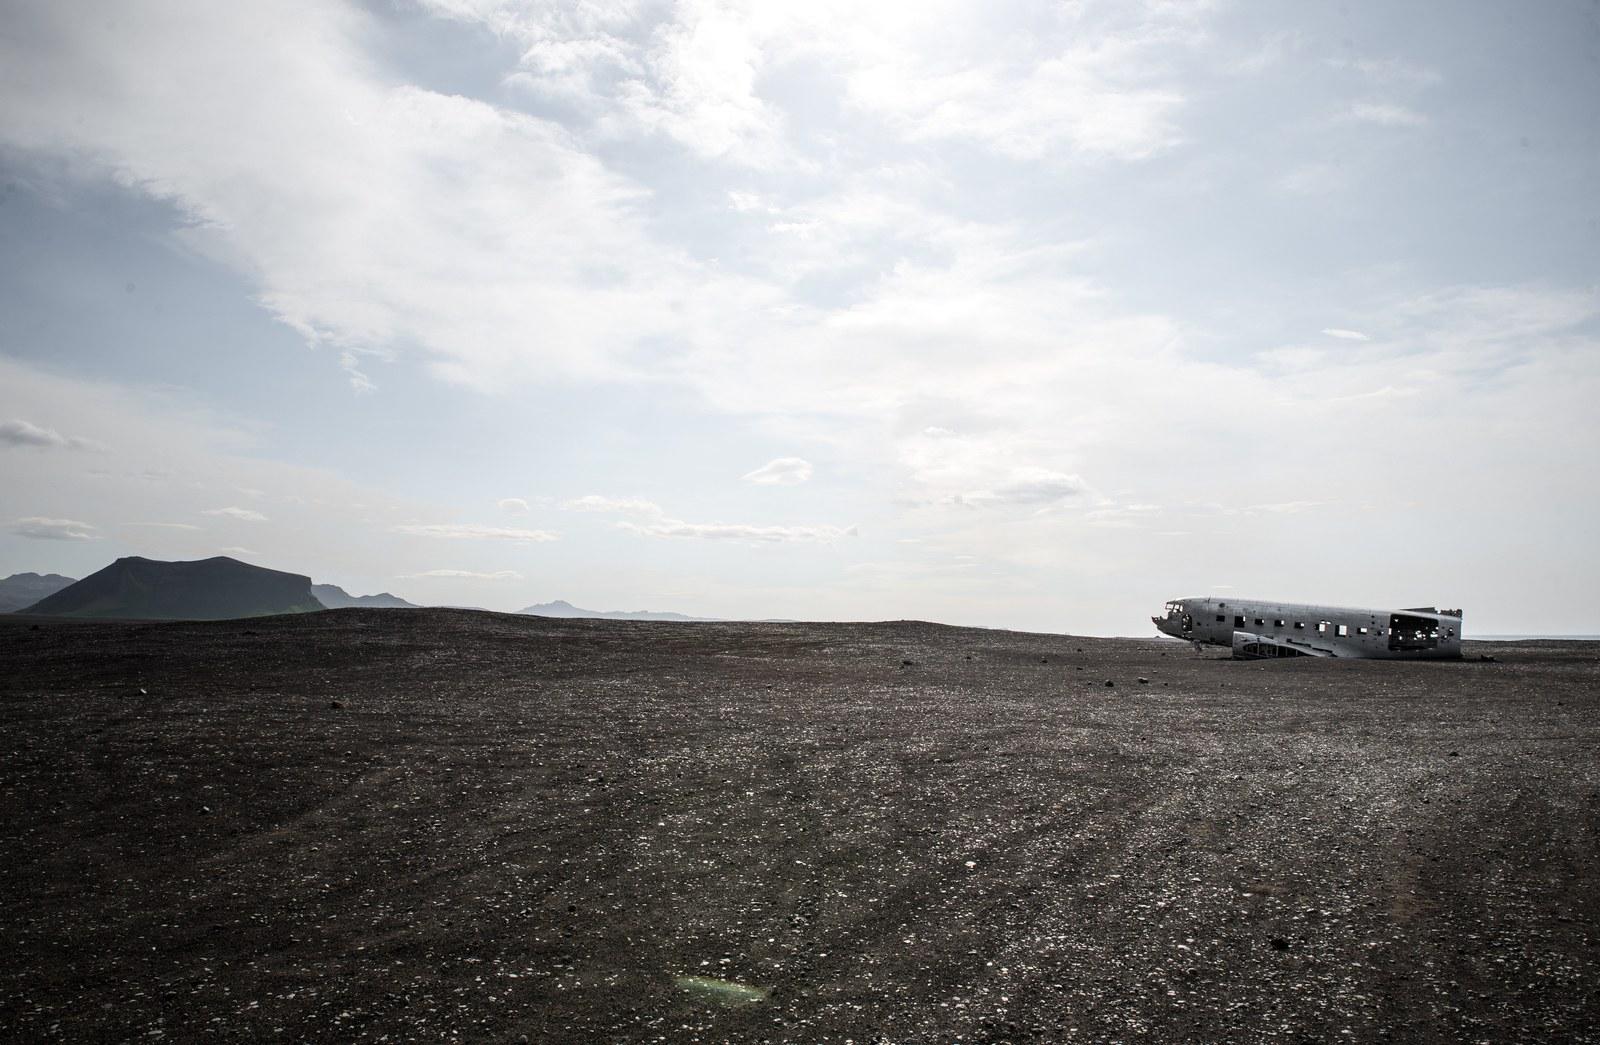 L'avion au milieu de Solheimasandur en Islande Solheimasandur